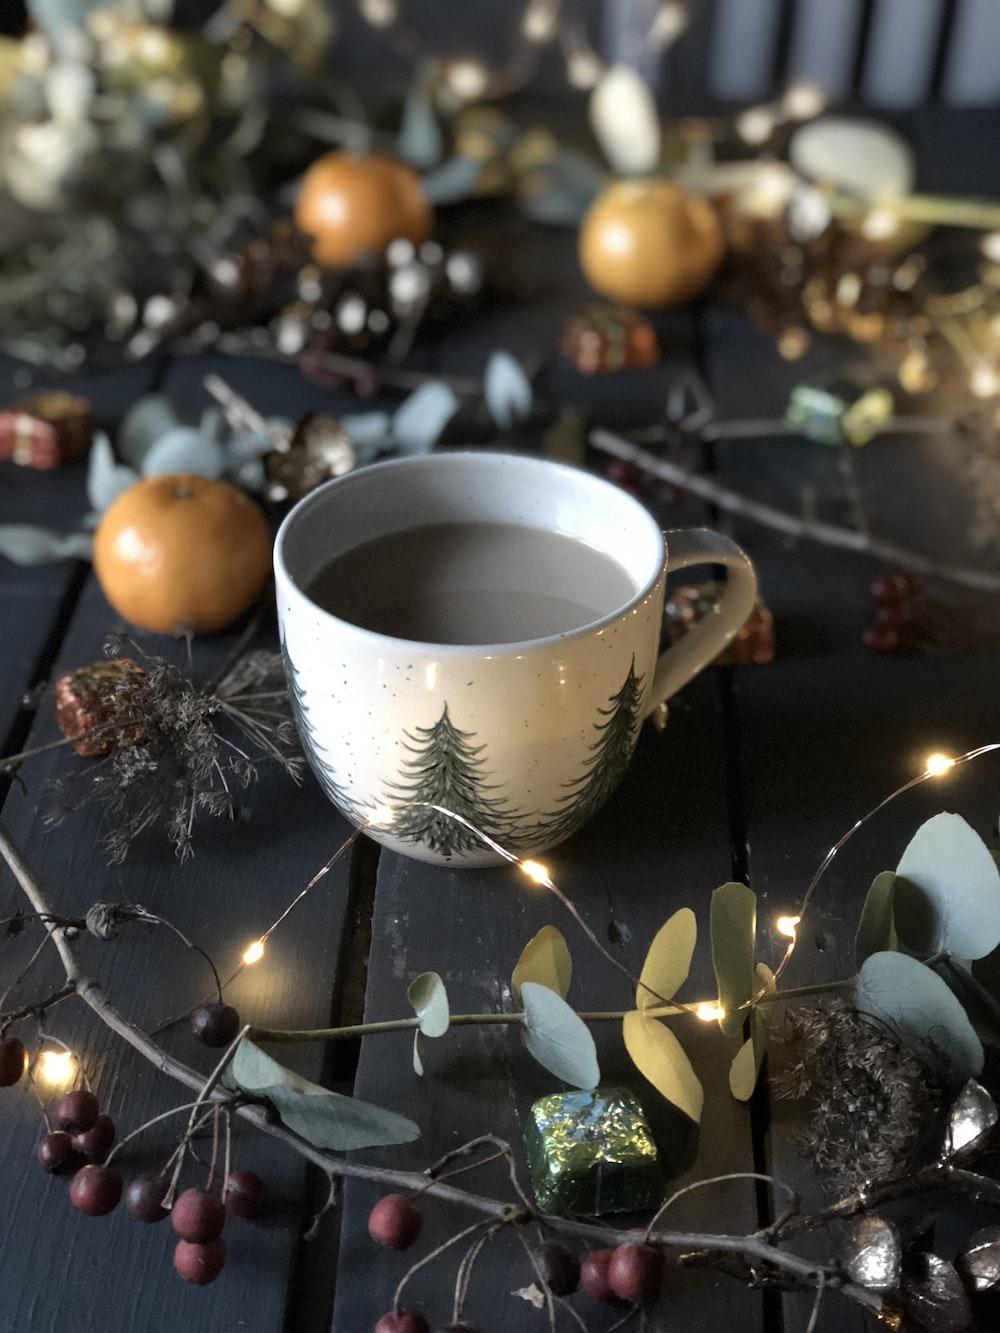 white teacup beside string lights